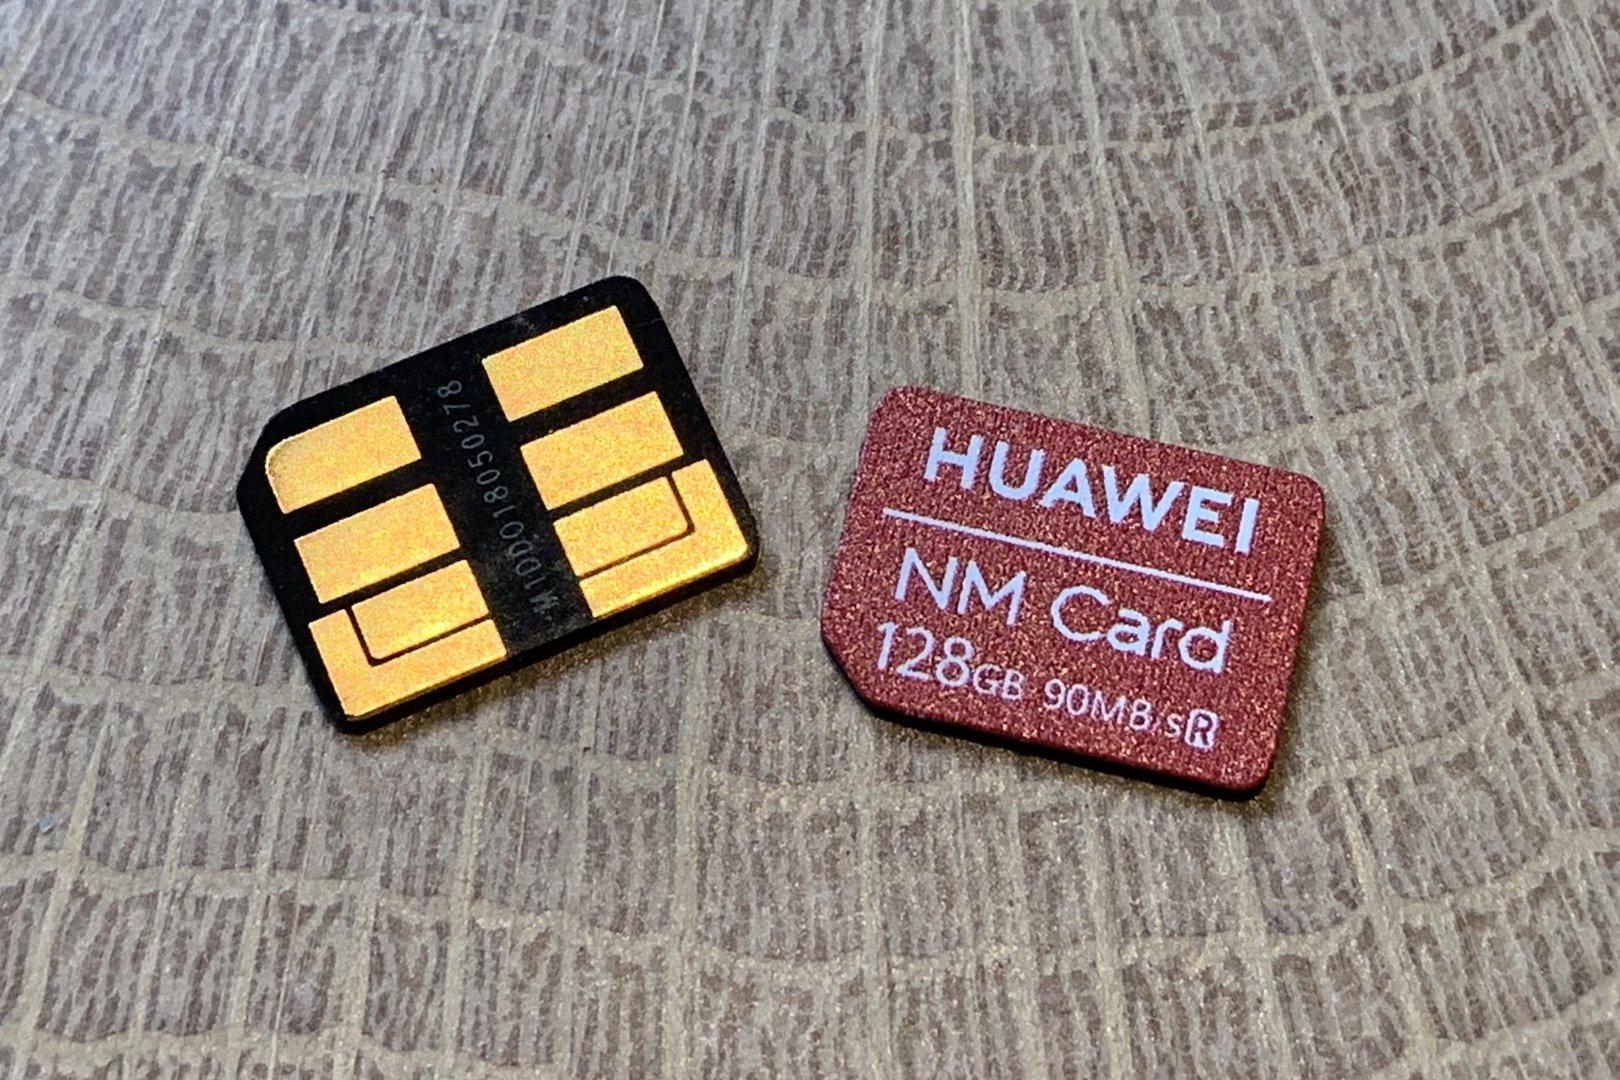 NanoSD-Karte von Huawei im Nano-SIM-Format